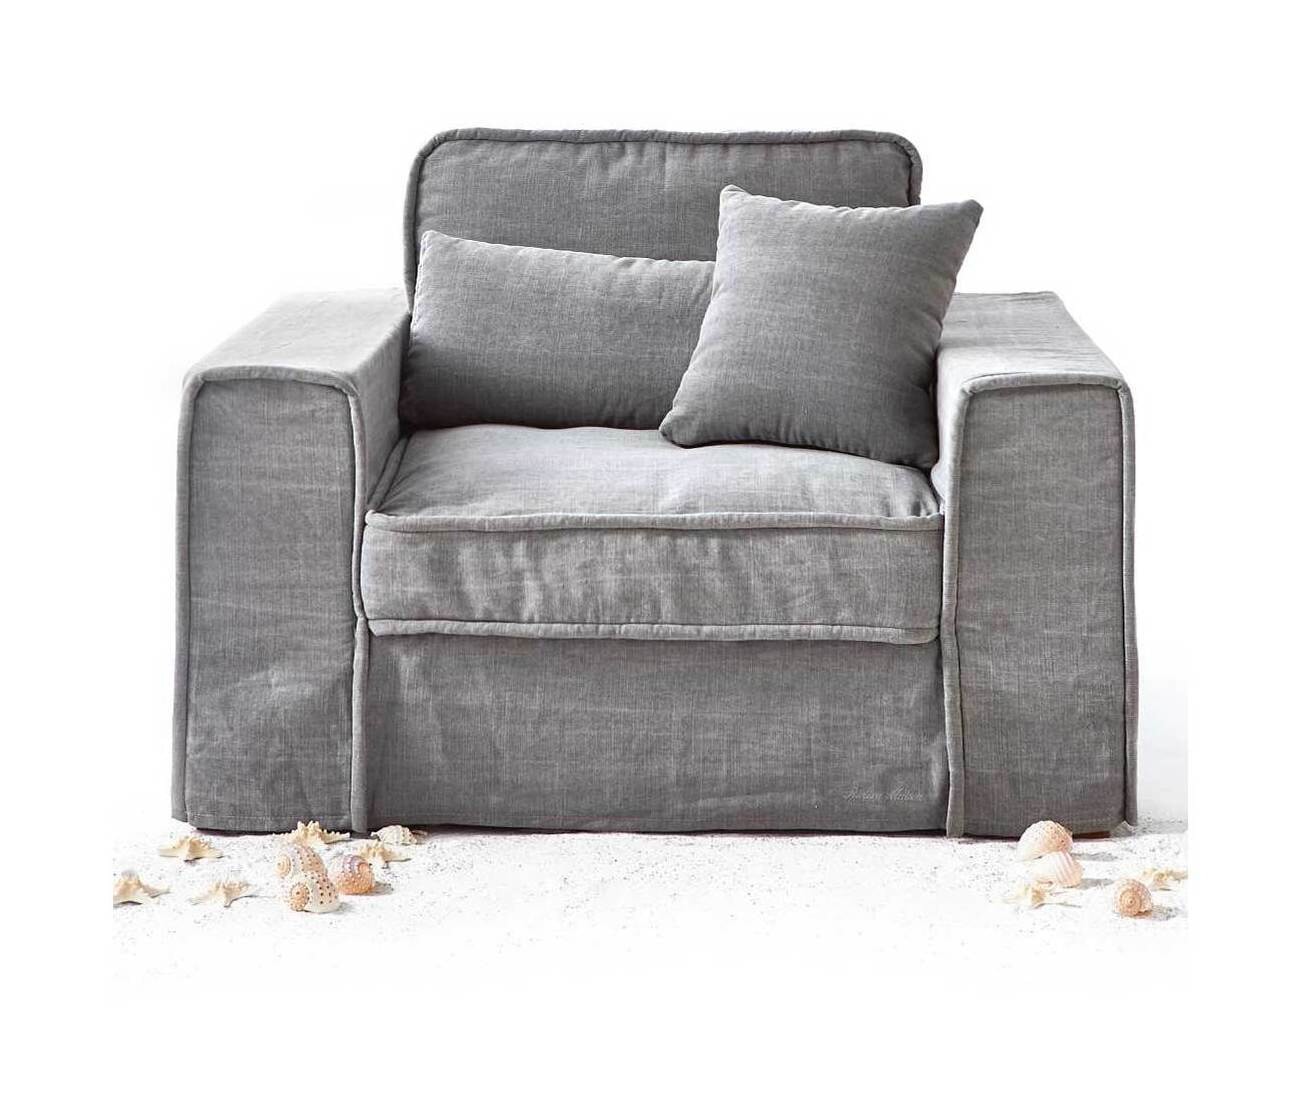 Riviera Maison Loveseat 'Metropolis' Cotton, kleur Grey